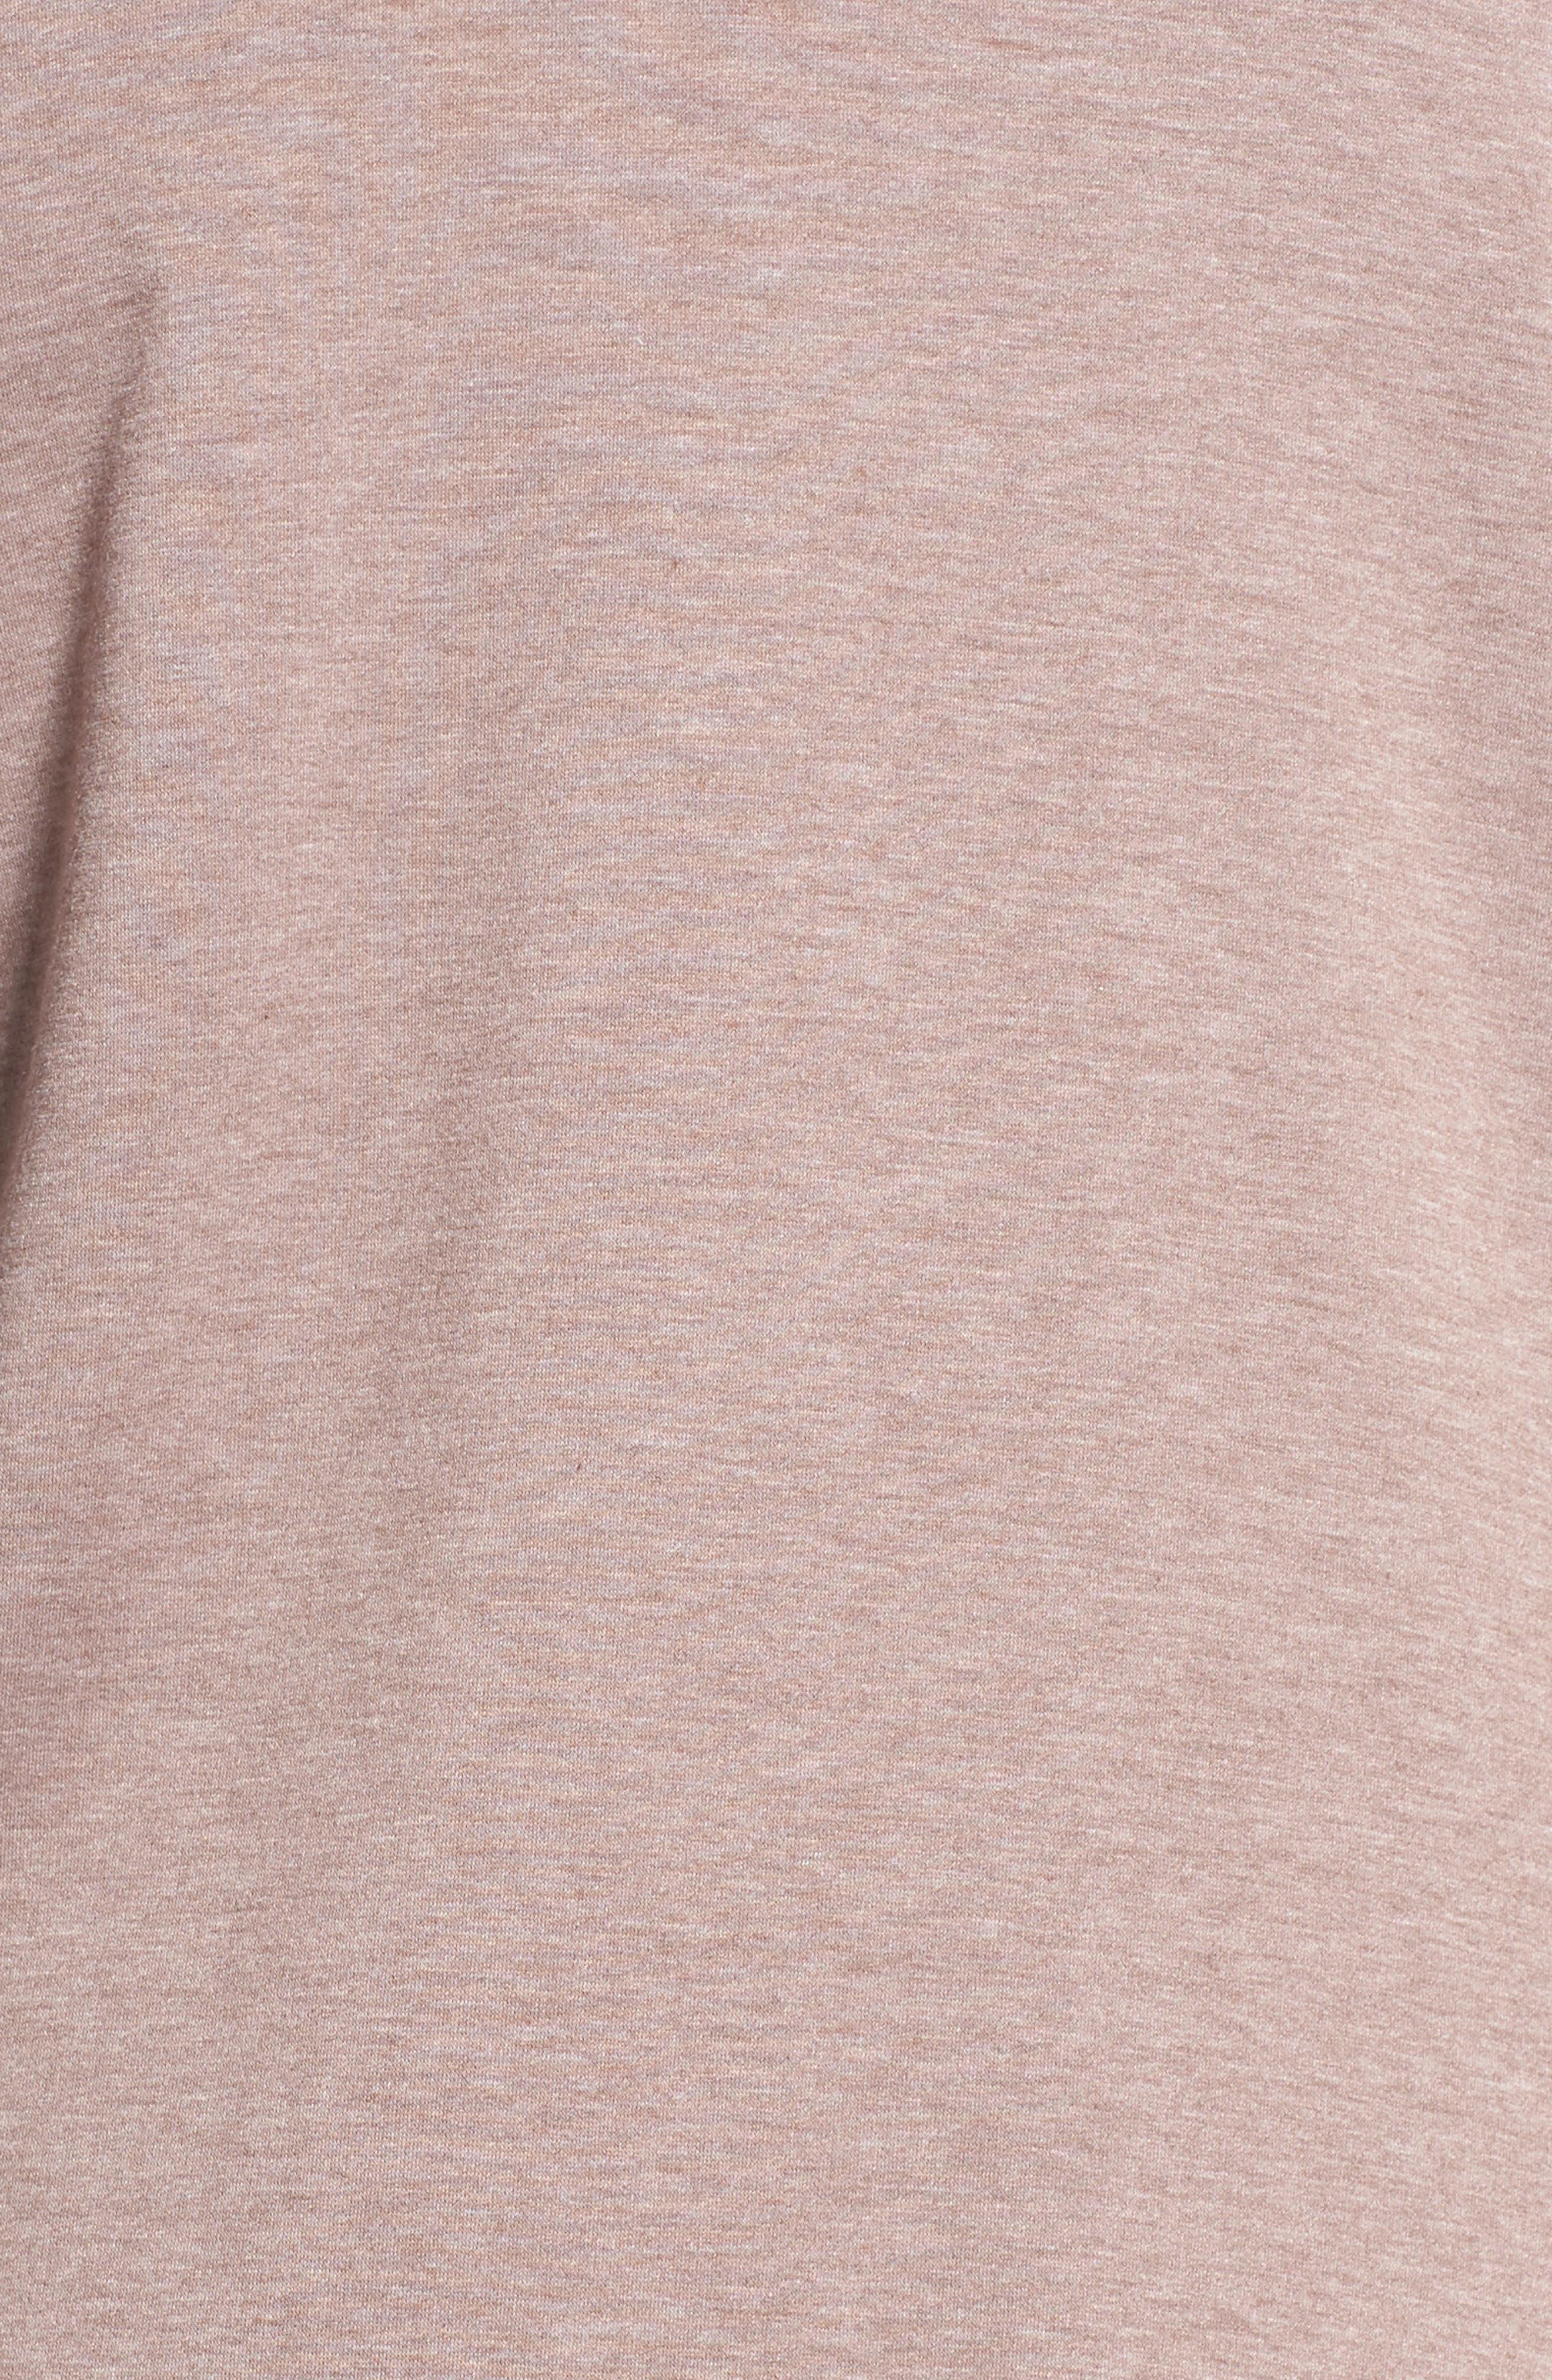 One-Button Fleece Cardigan,                             Alternate thumbnail 201, color,